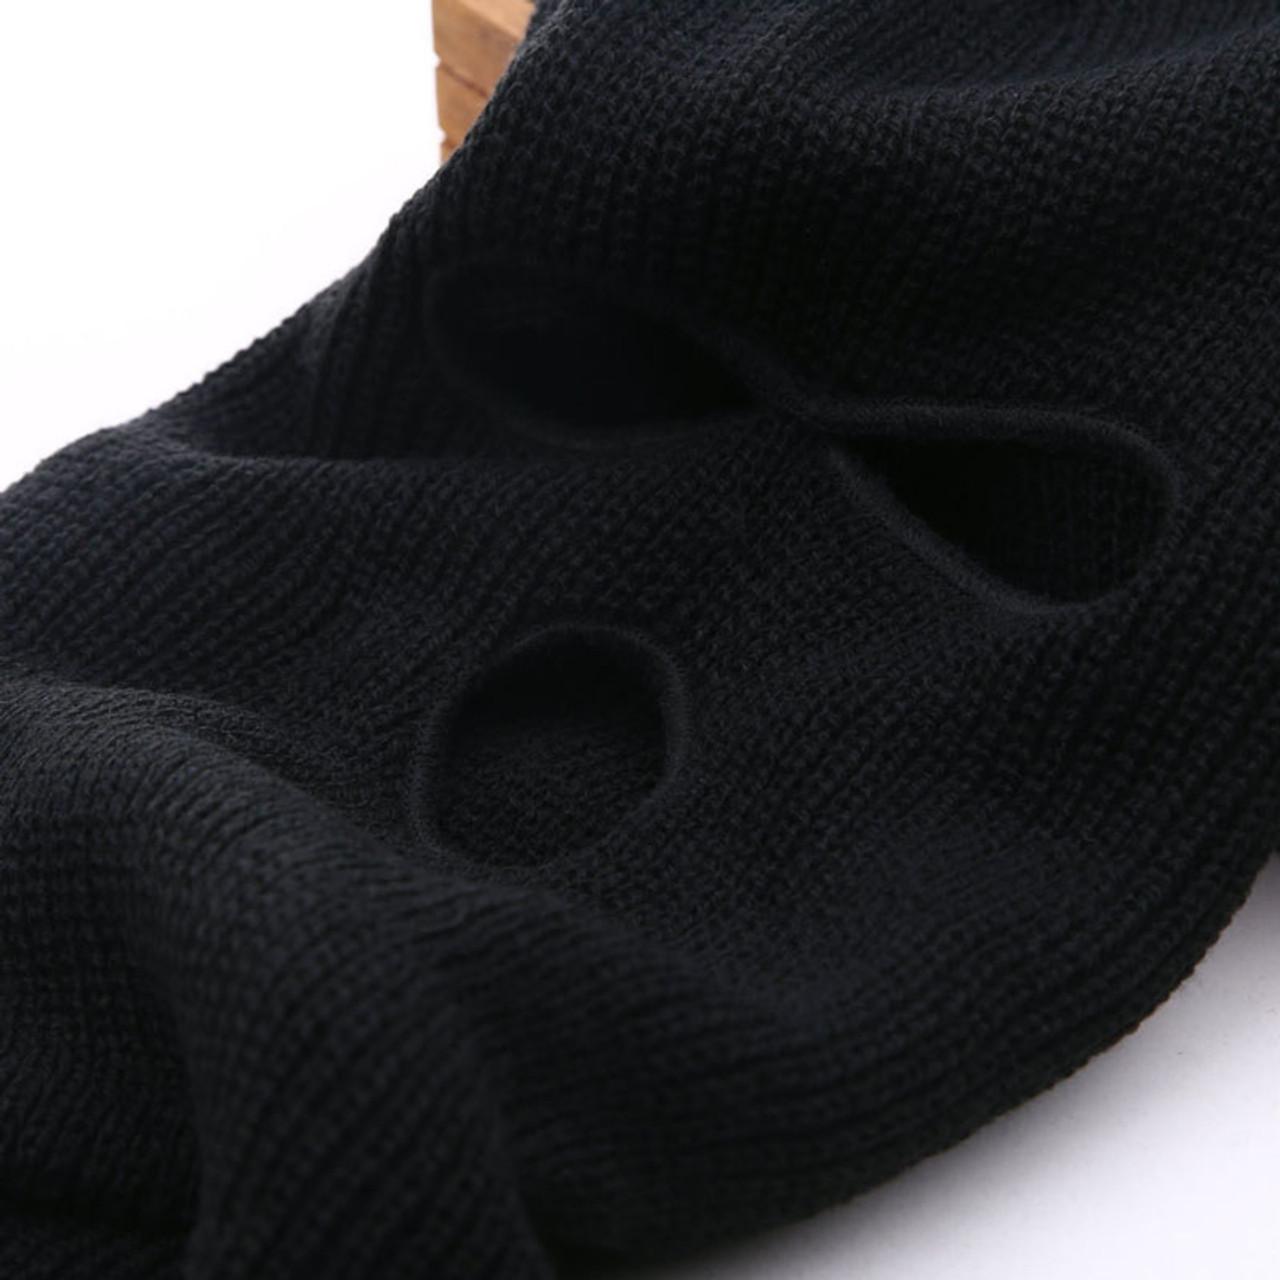 faecd46841c0c ... 3 Hole Ski Mask Balaclava Black Knit Hat Face Shield Beanie Cap Snow  Winter Warm ...